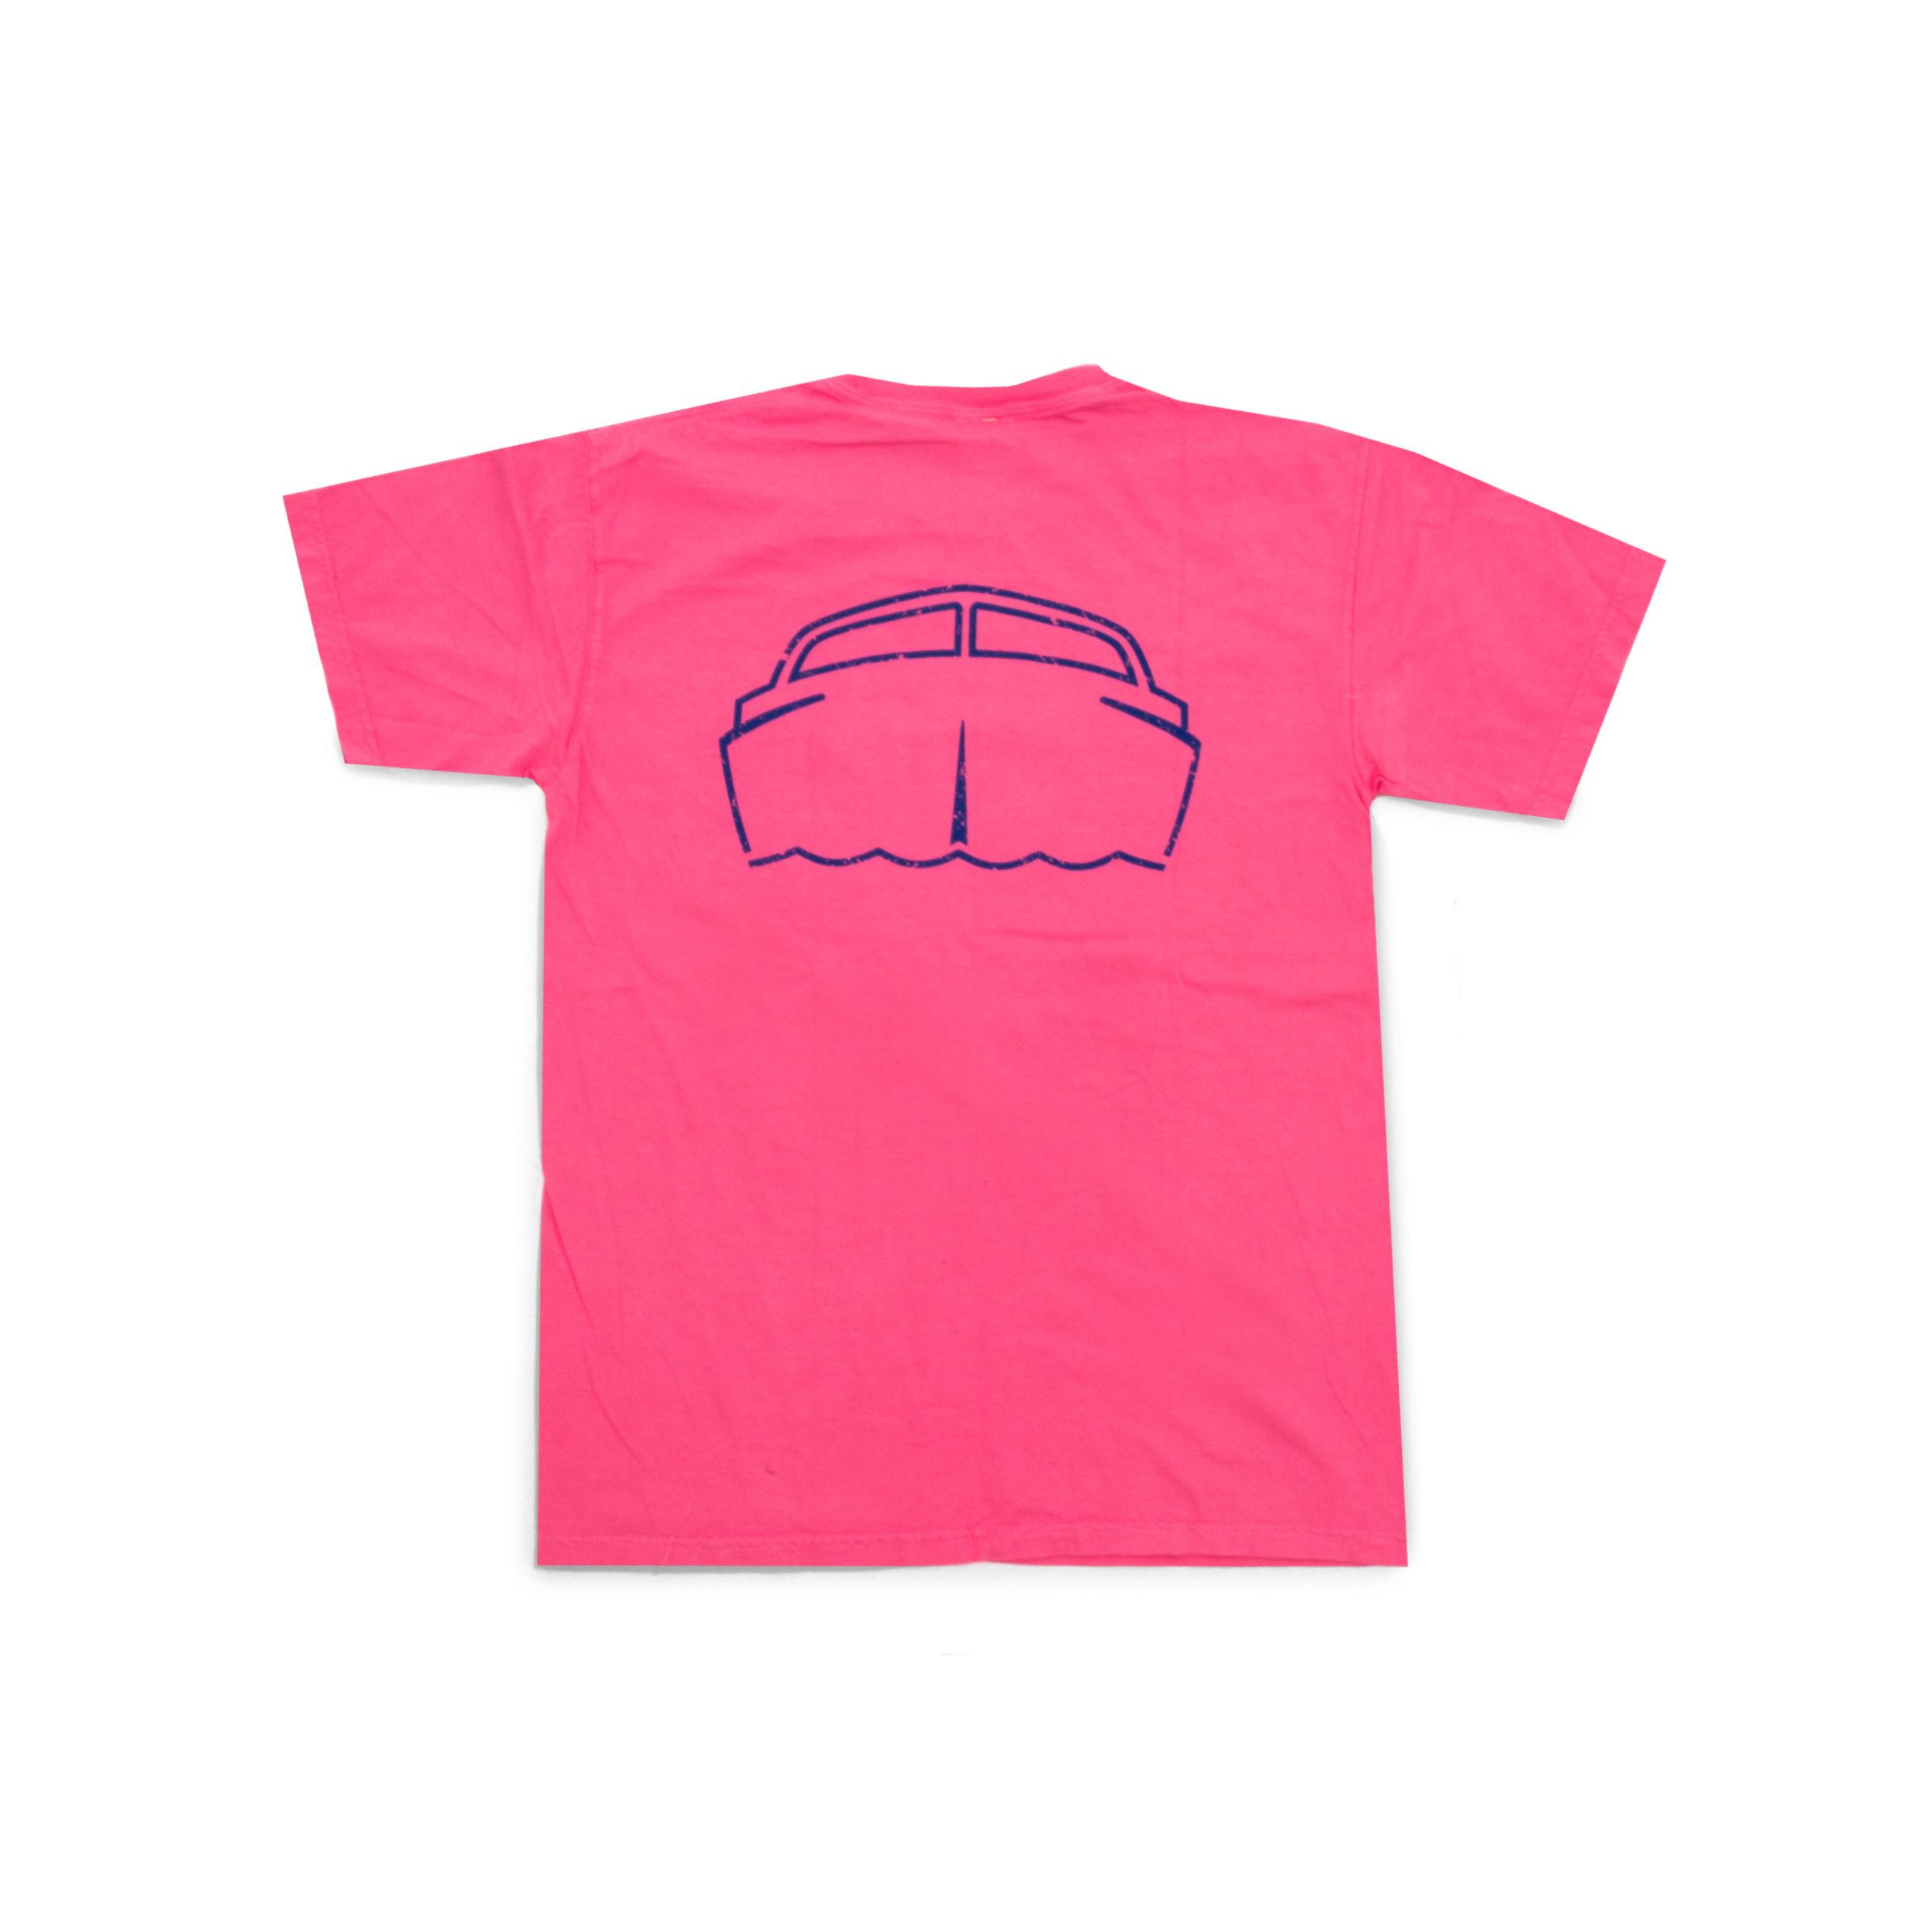 0bcca4e5 85 Miles Short-Sleeve Vintage Boat Pocket T-Shirt - Peony ...